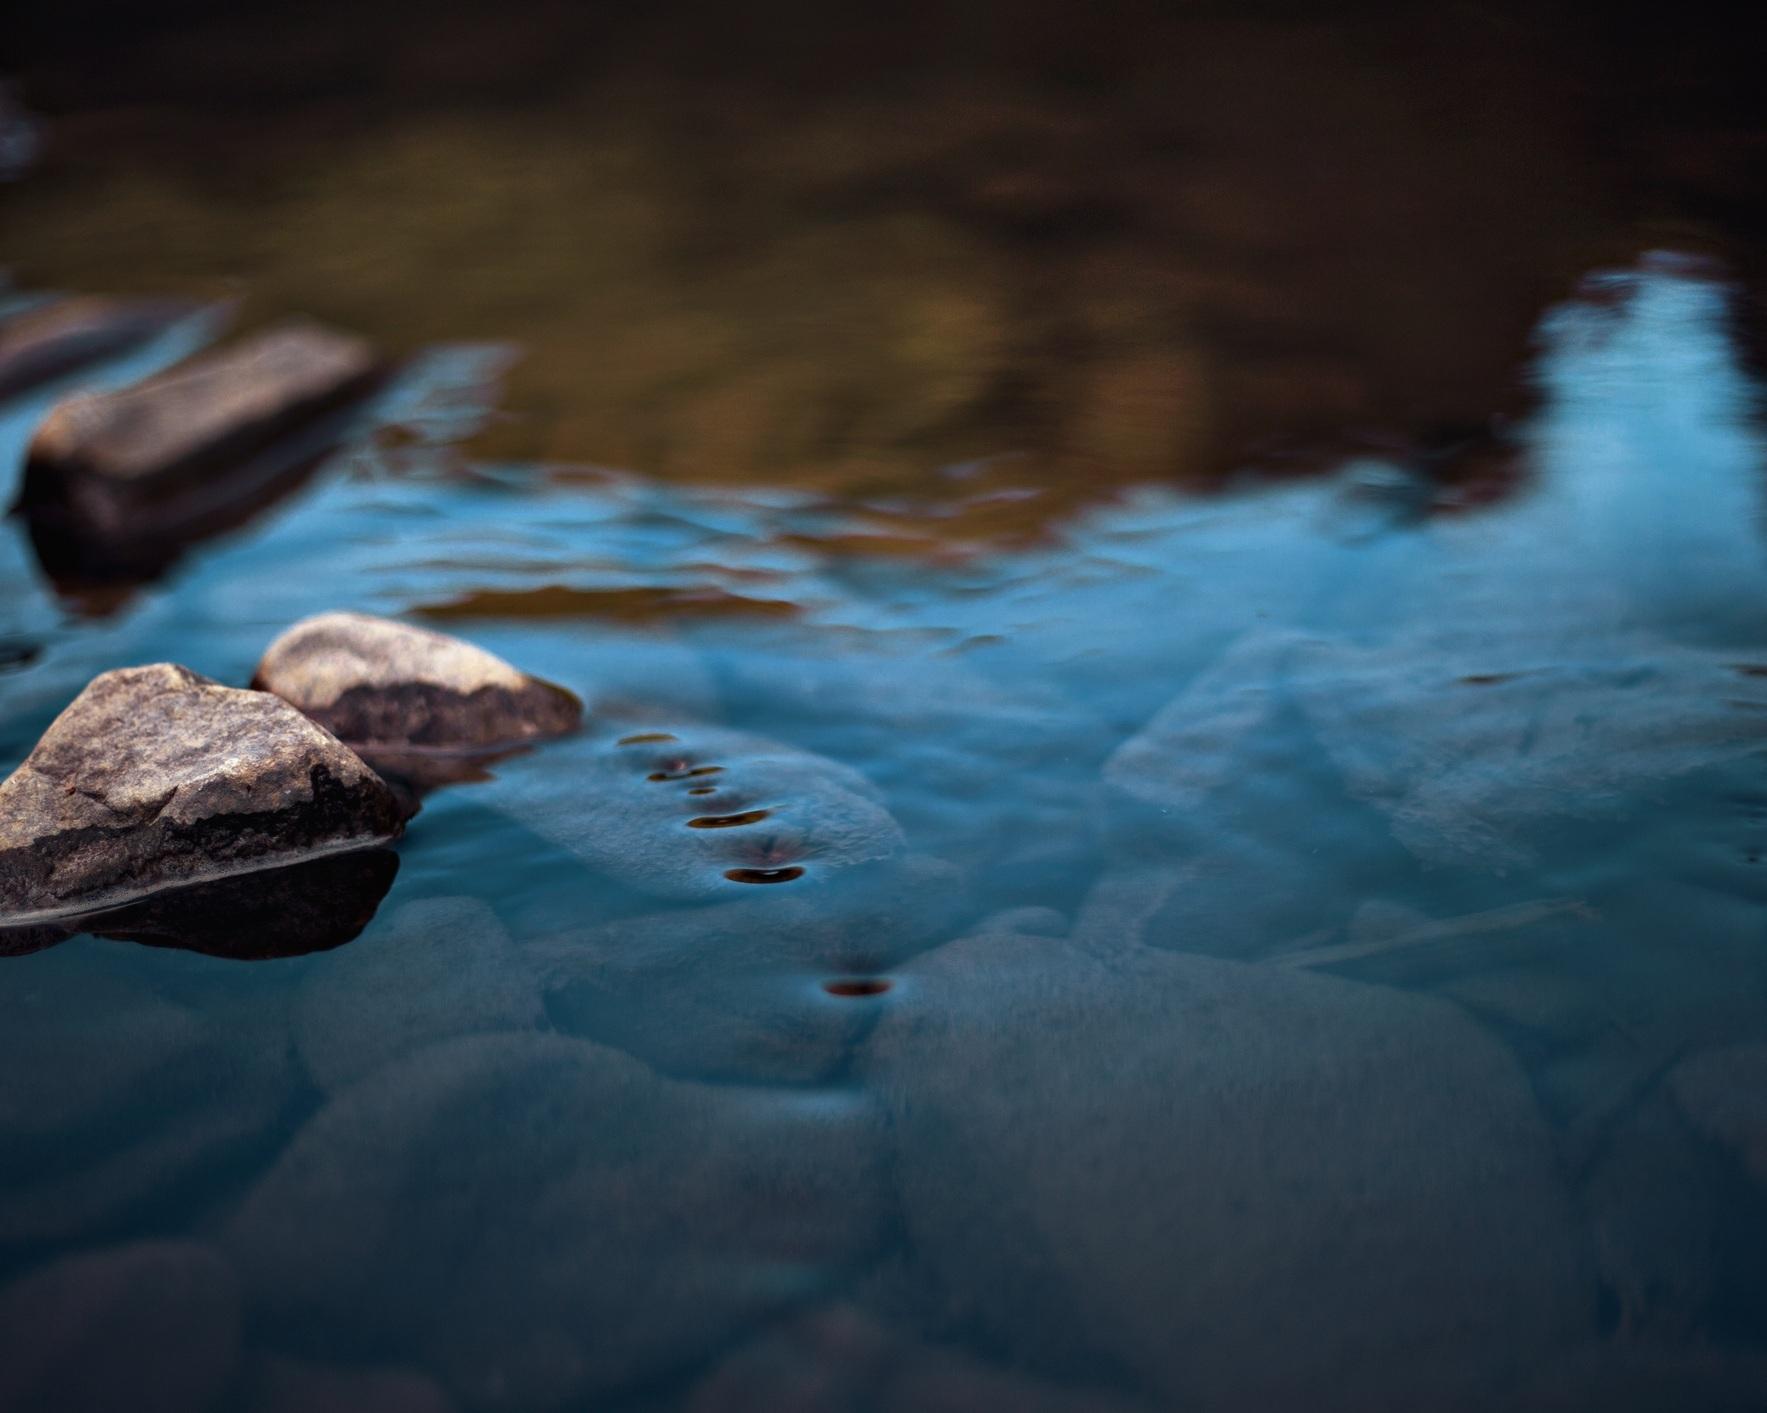 Nooksack Salmon Enhancement Association - Washington, 2015Alluvial Fan Floodplains: Restoration for a Changing Climate